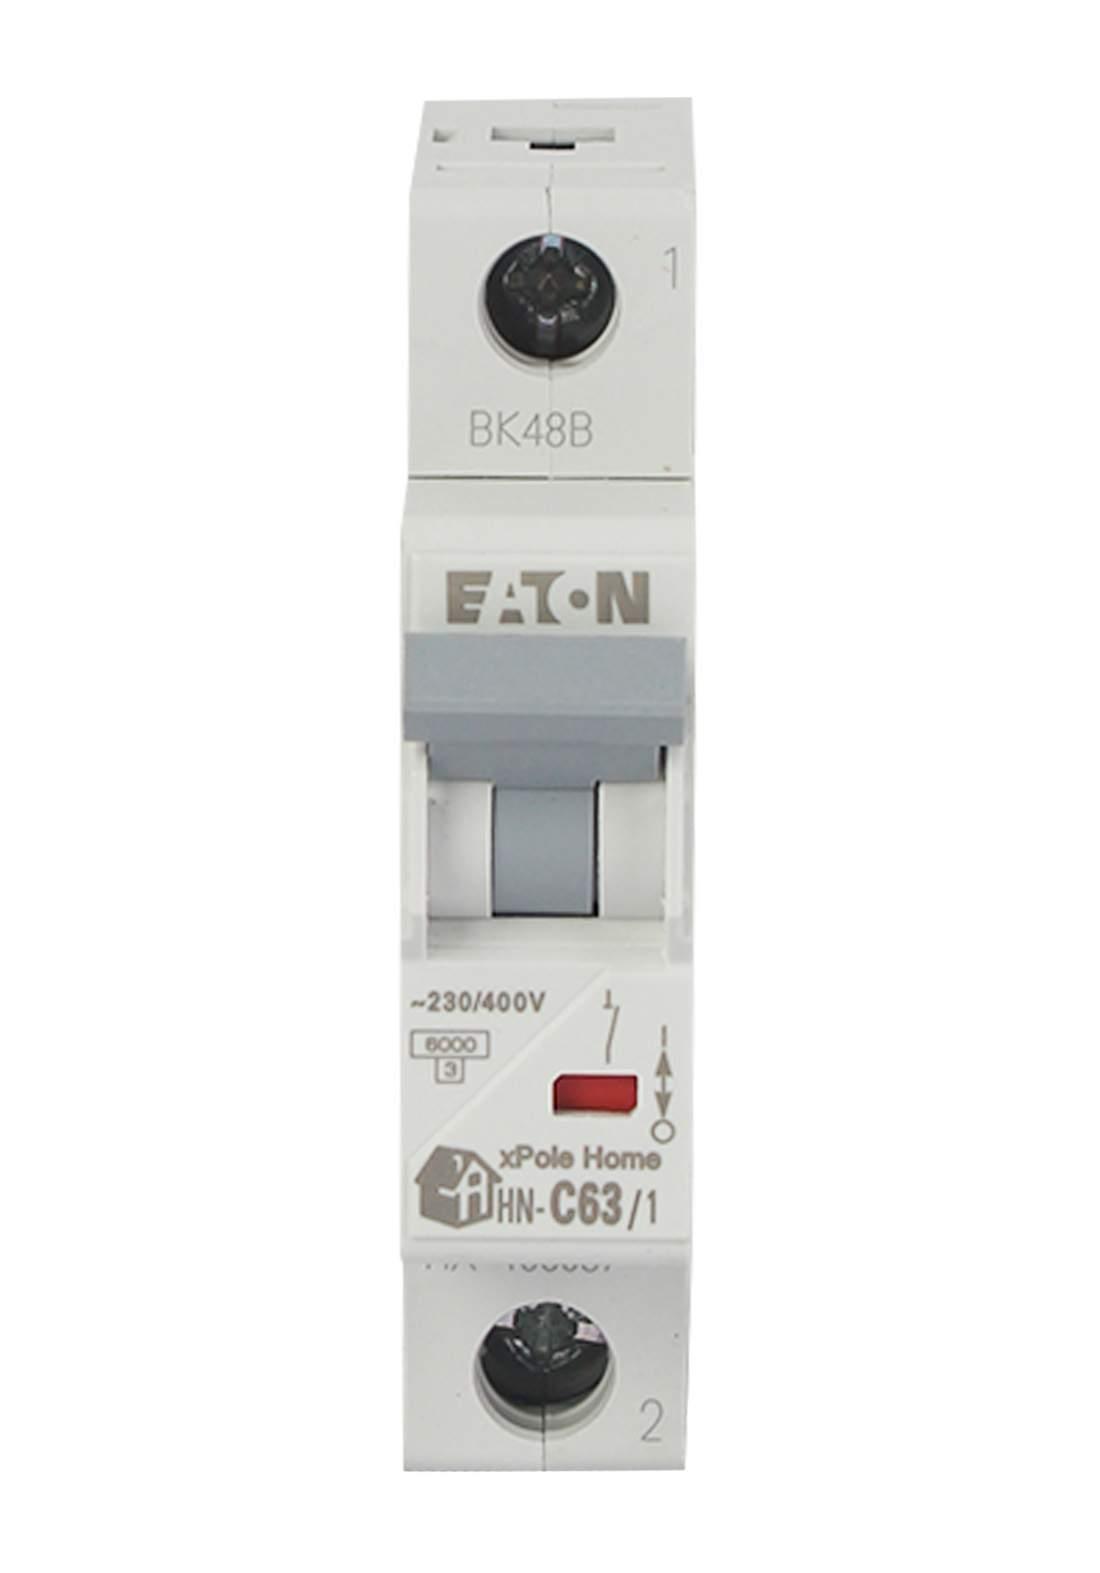 Eaton HN-C63/1-HX Circuit Breaker 63A قاطع تيار الكهرباء (جوزة)